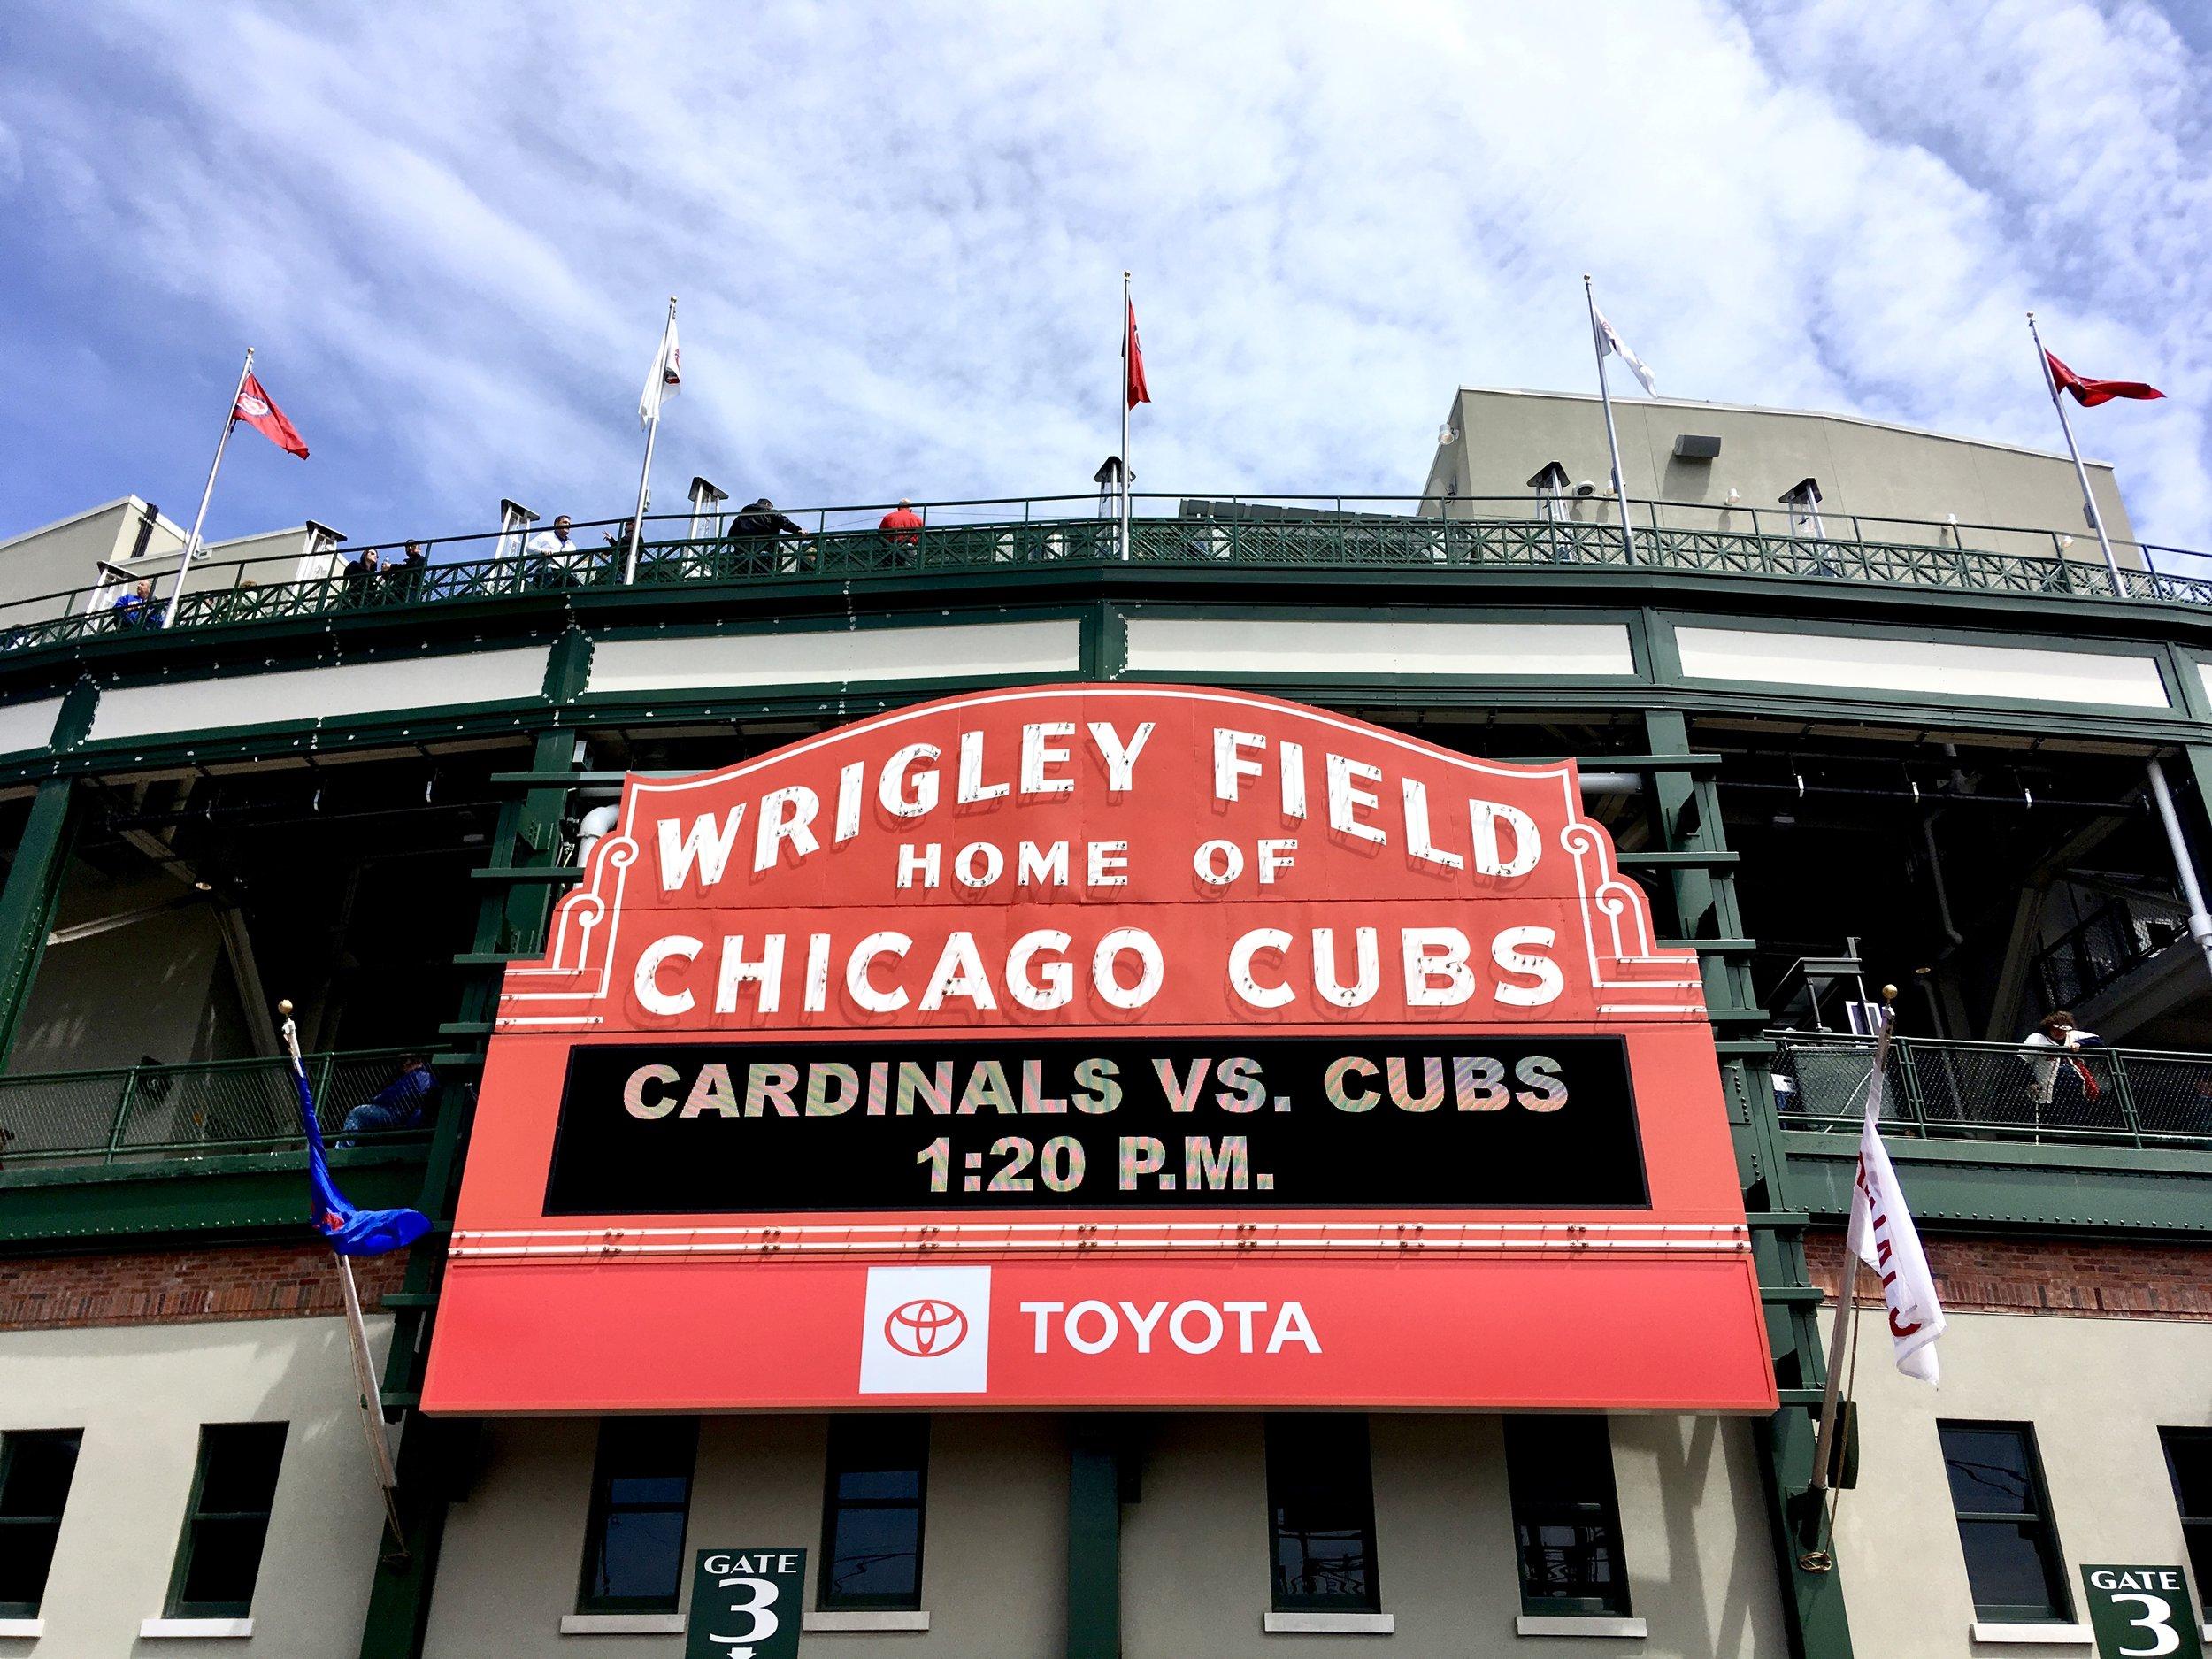 Chicago Cubs Stadium - Wrigley Field